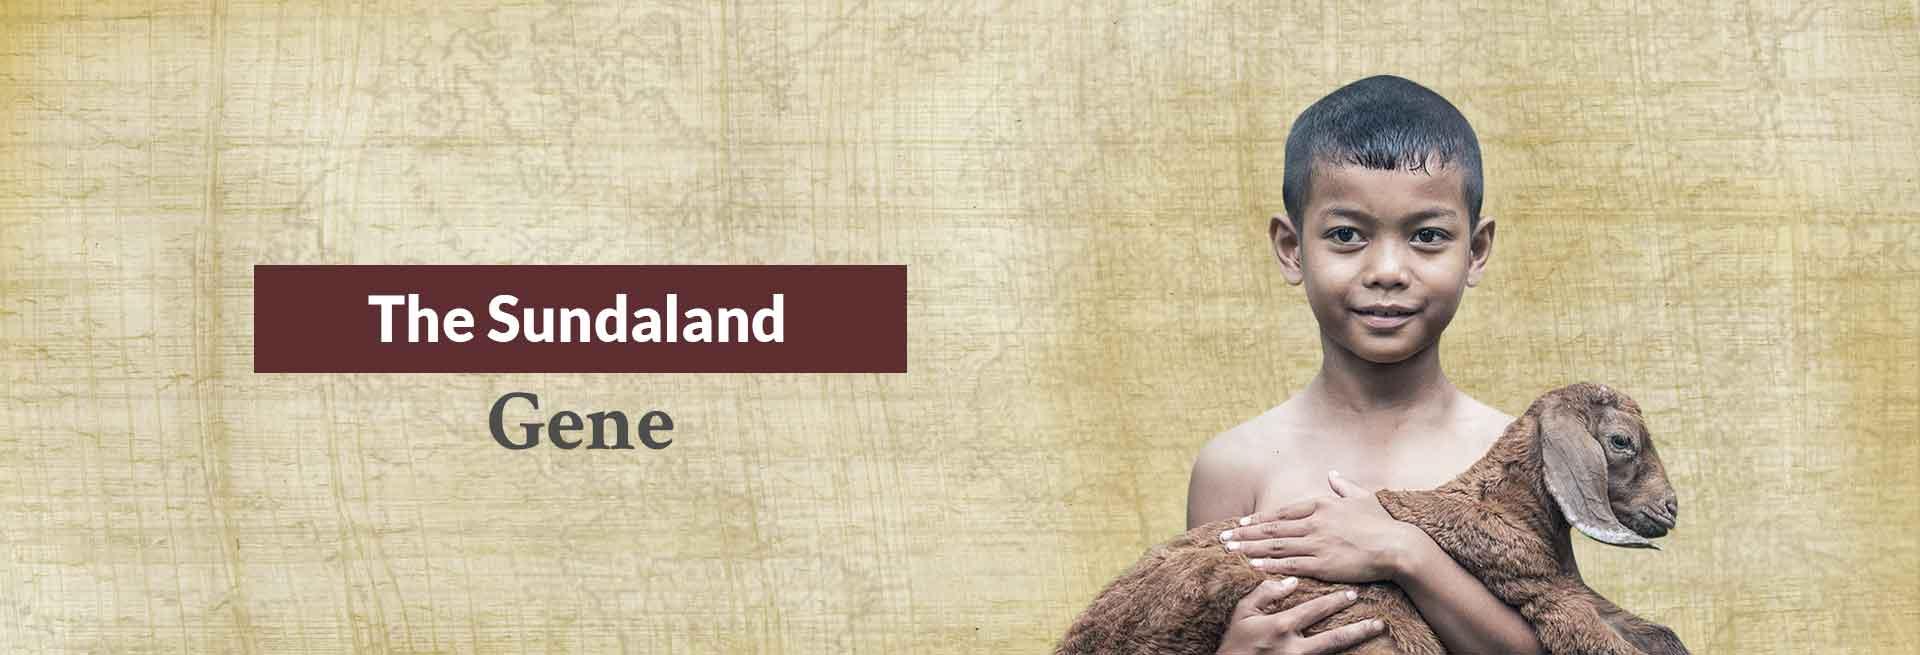 The Sundaland Gene Banner